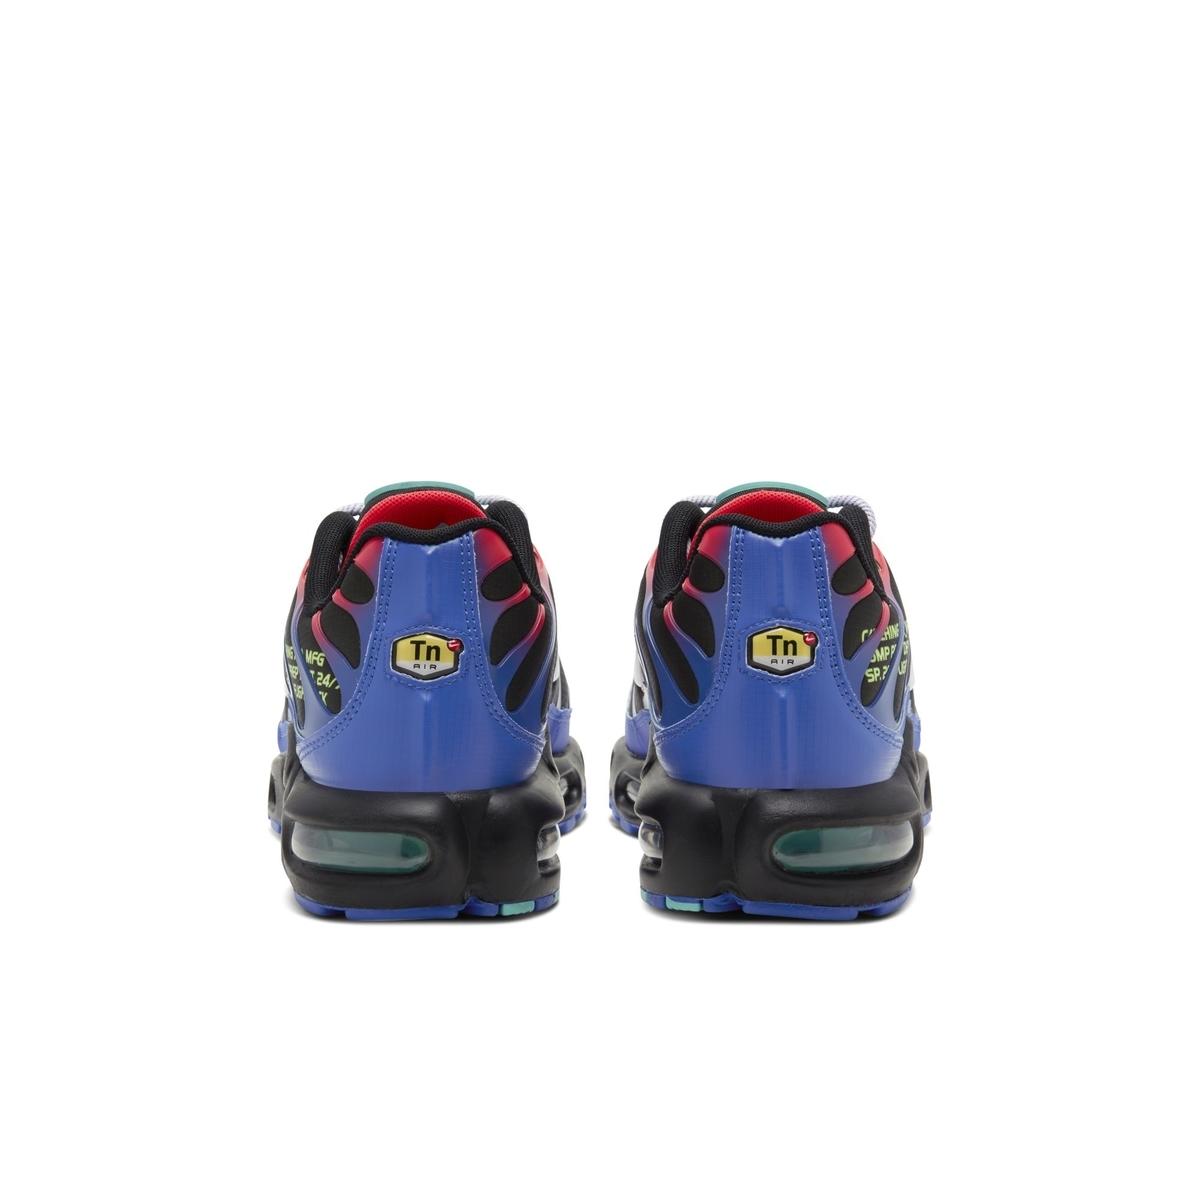 Nike,Air Max Plus,发售,CV7541-00 多彩降落伞!这双 Air Max Plus 藏着 Nike 的新惊喜!